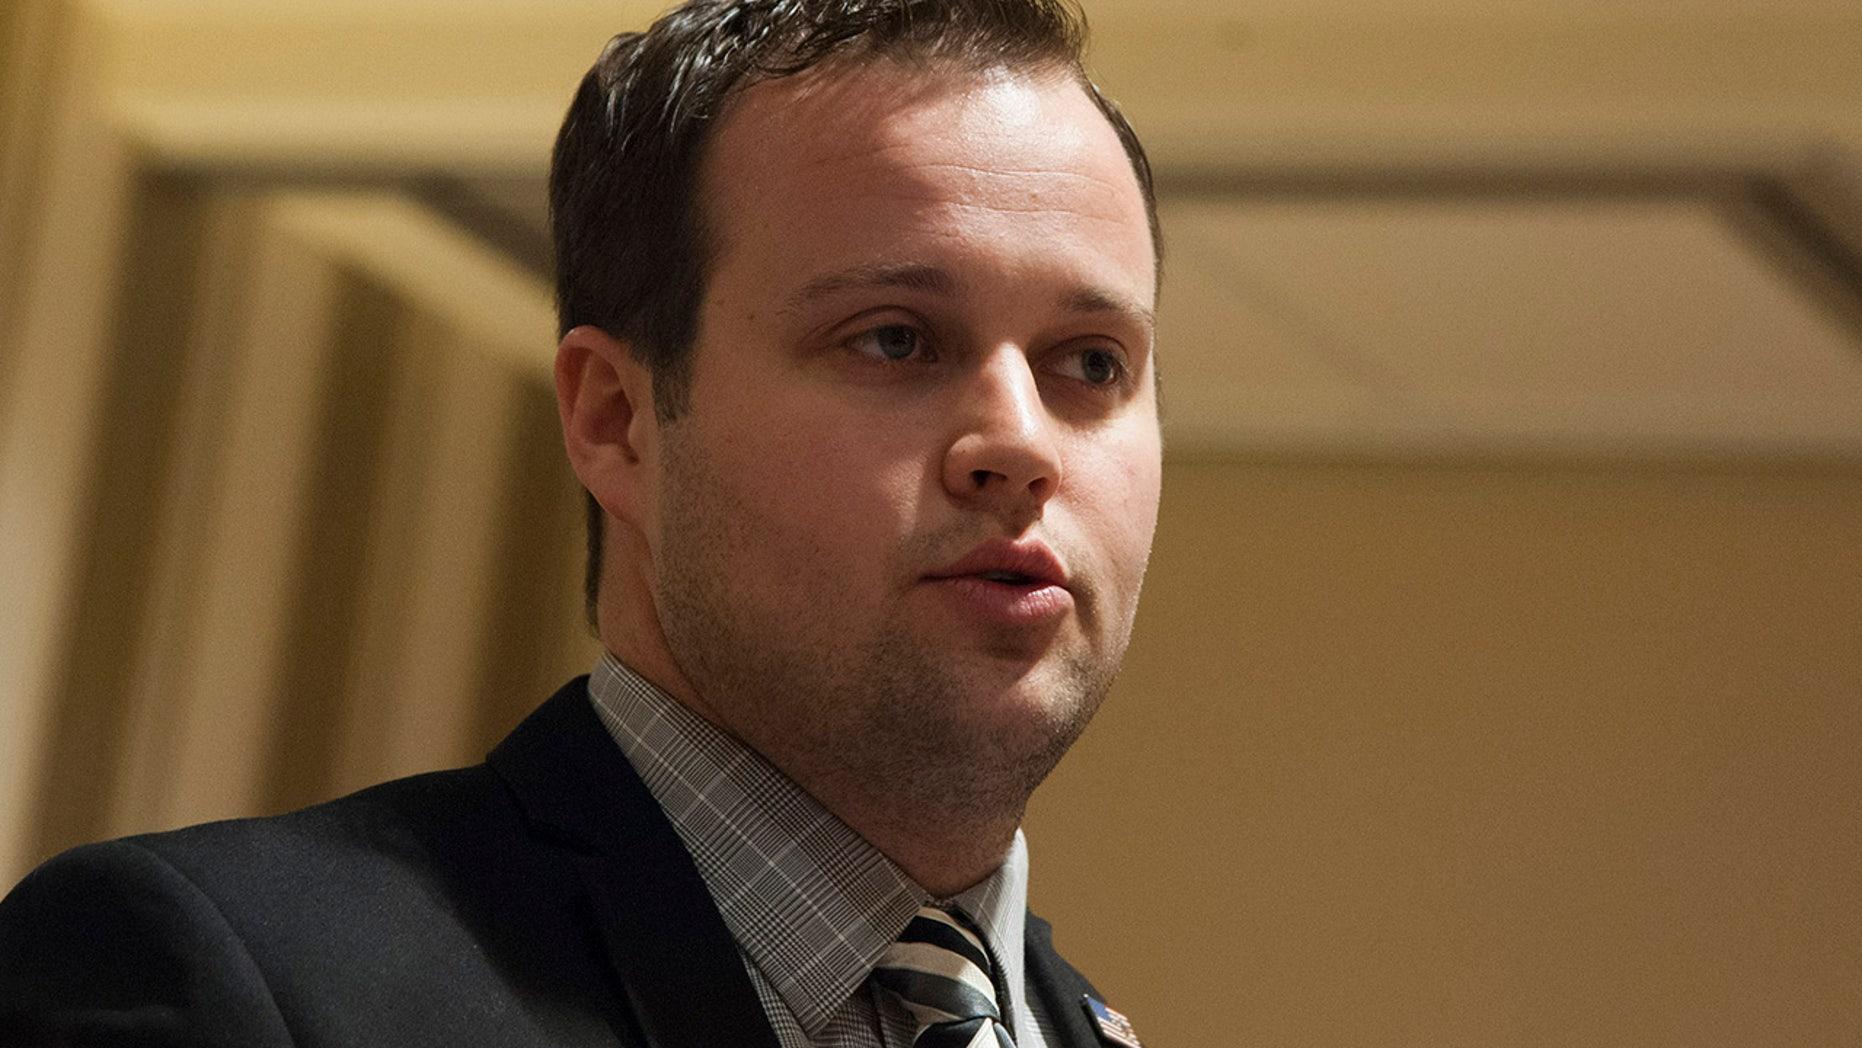 U.S. attorneys respond to Josh Duggar's request to delay child pornography trial